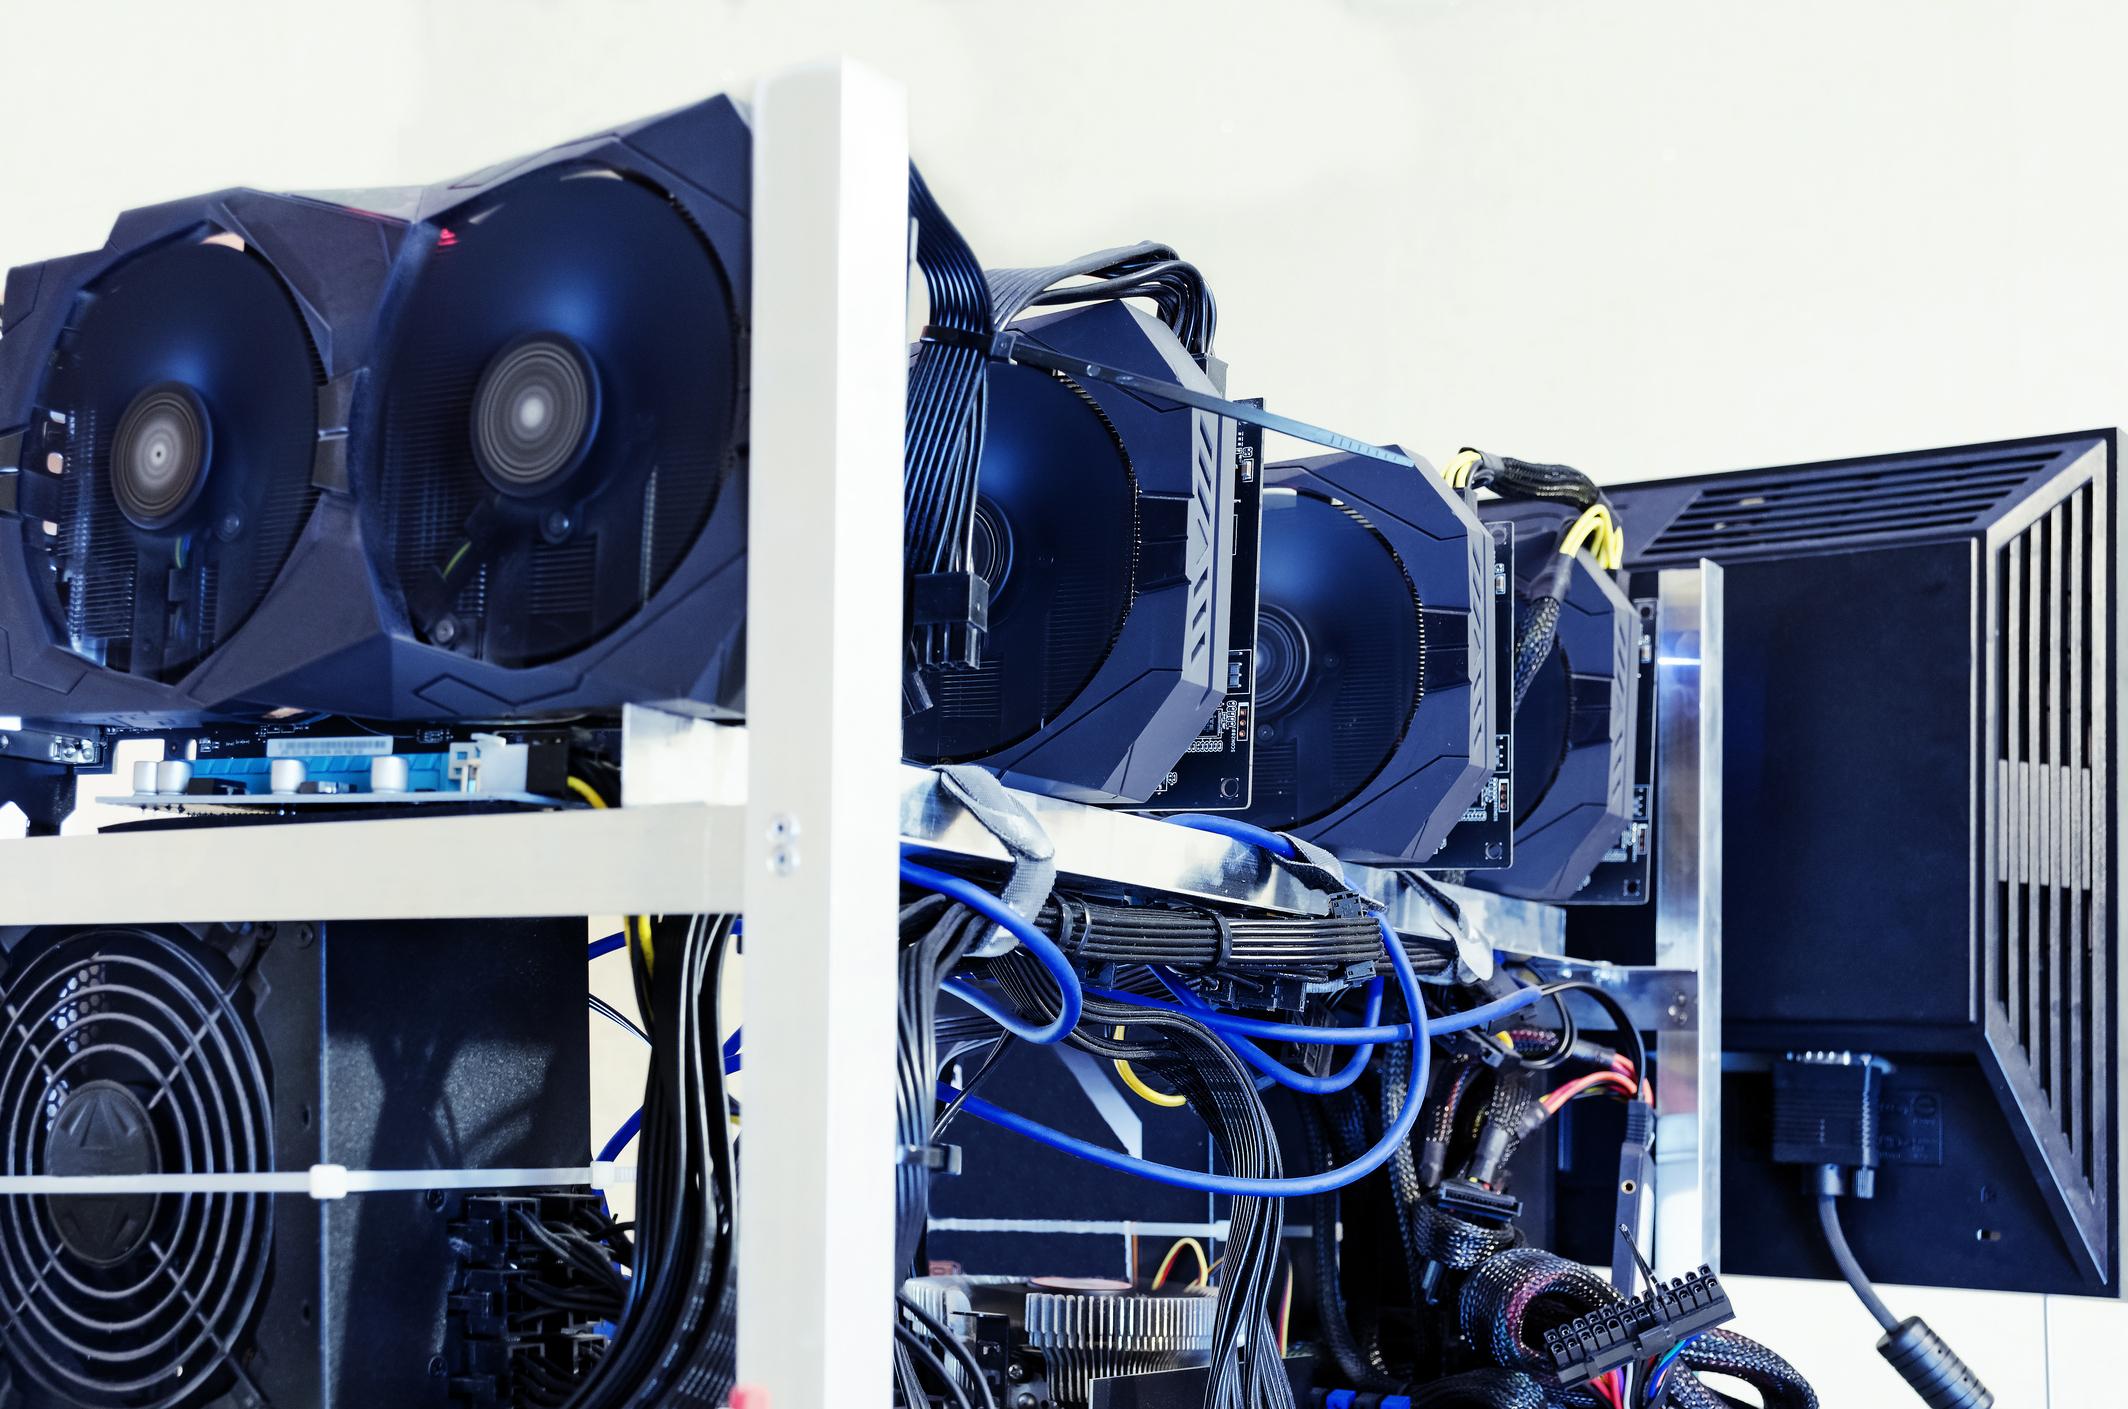 Graphics processing units and hard drives